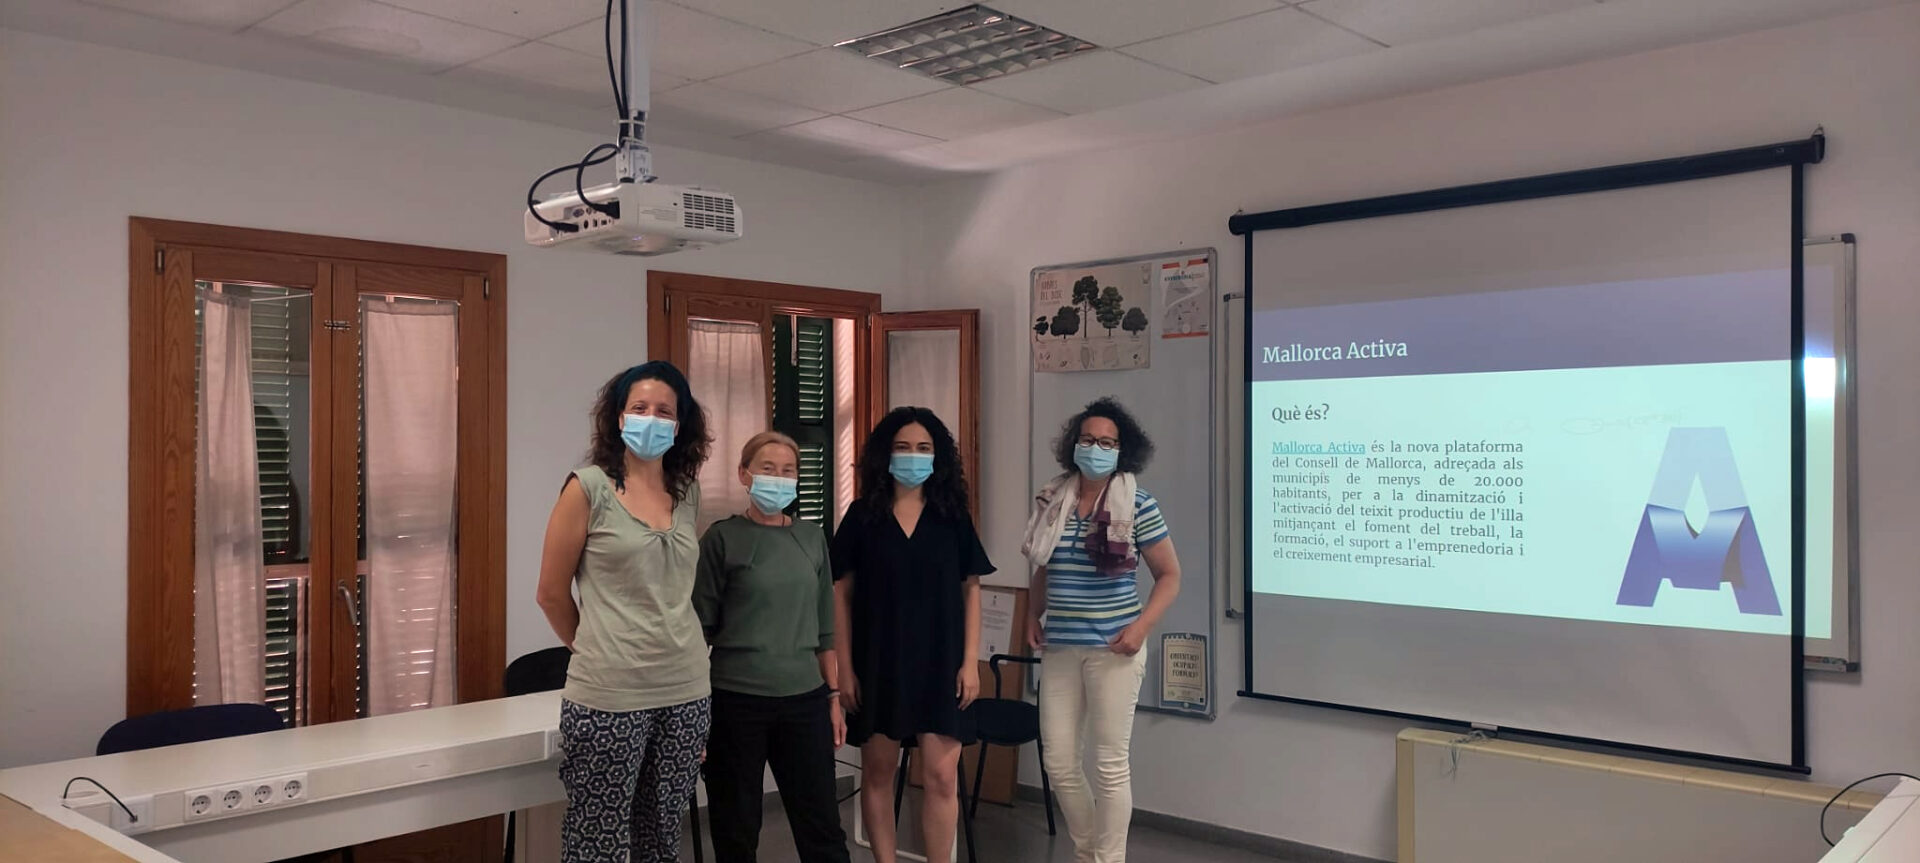 Mallorca Activa Esporles dones emprenedores